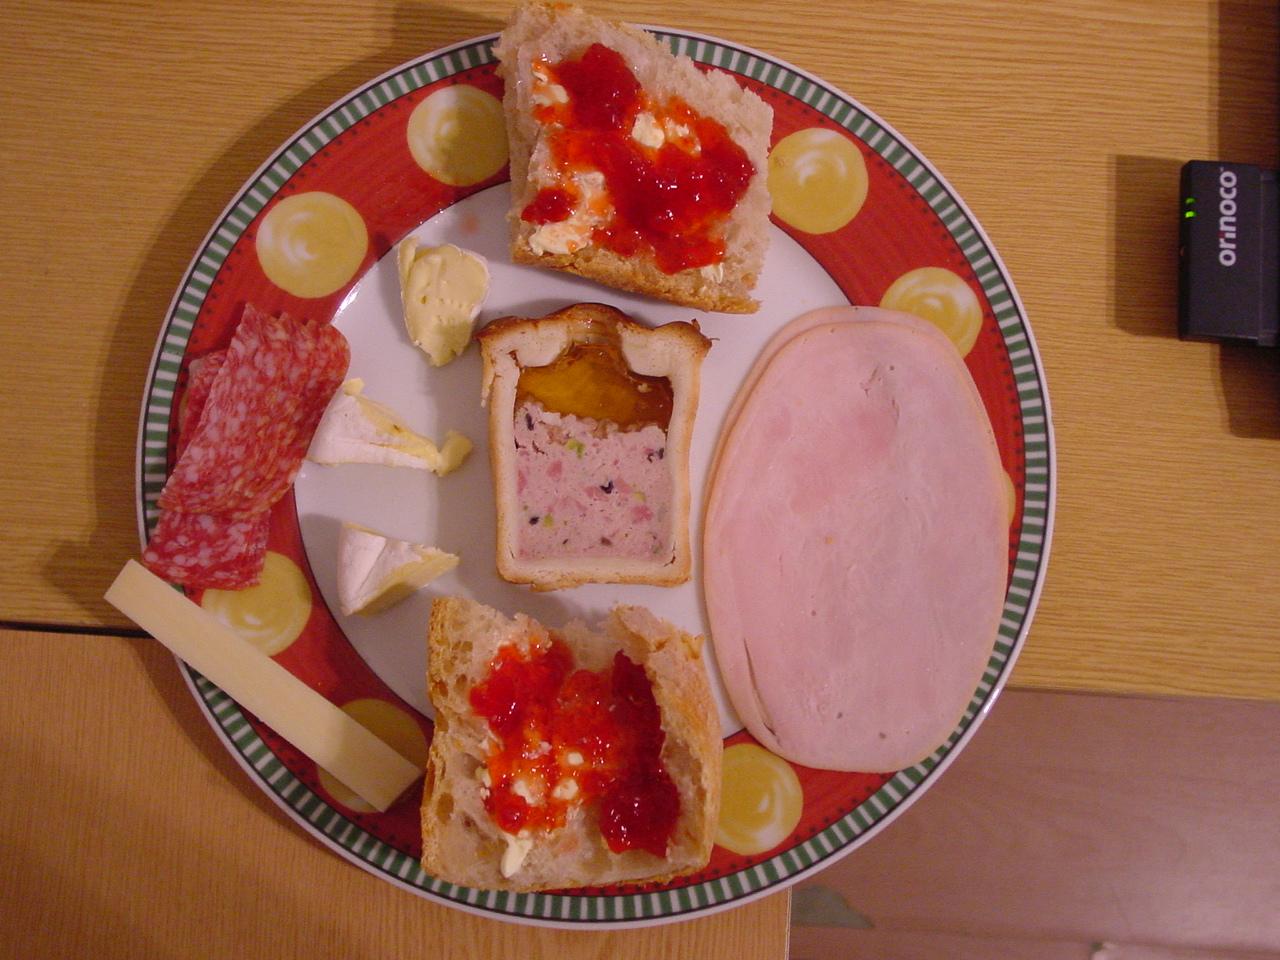 https://foodloader.net/xSh_2007-10-27_Fruehstuecksplatte.jpg